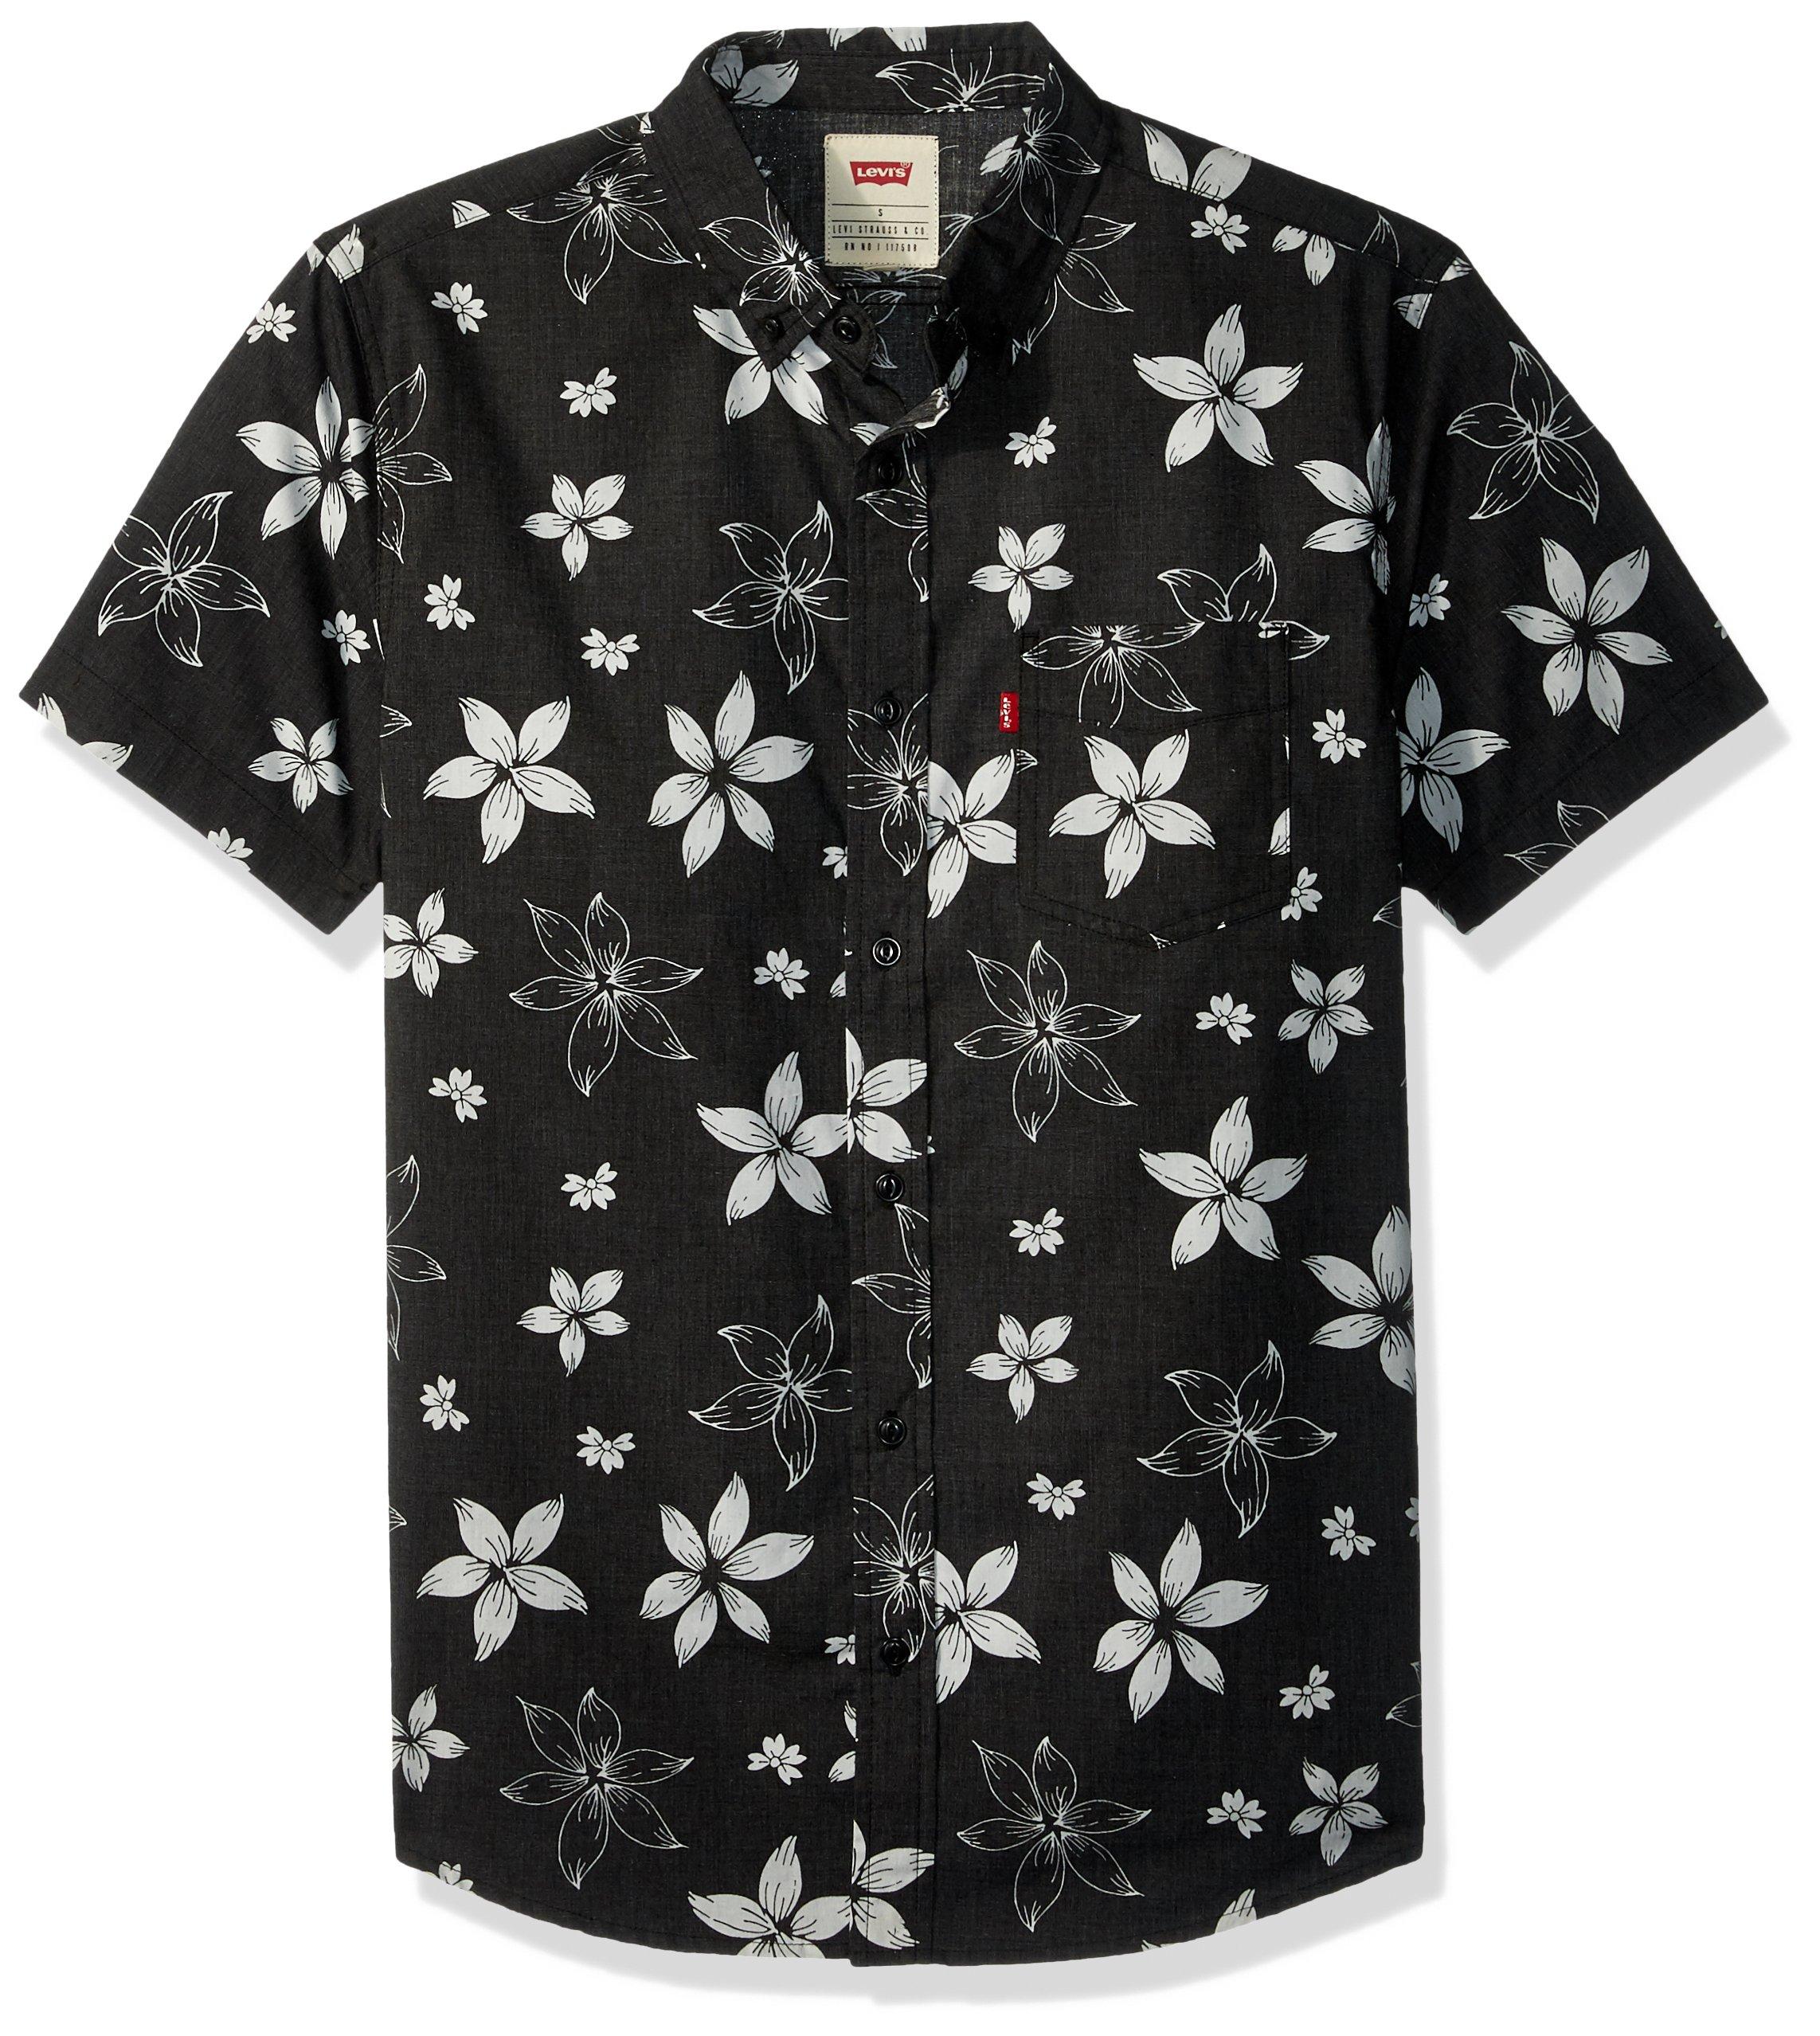 Levi's Gatland – Camisa tejida de manga corta para hombre